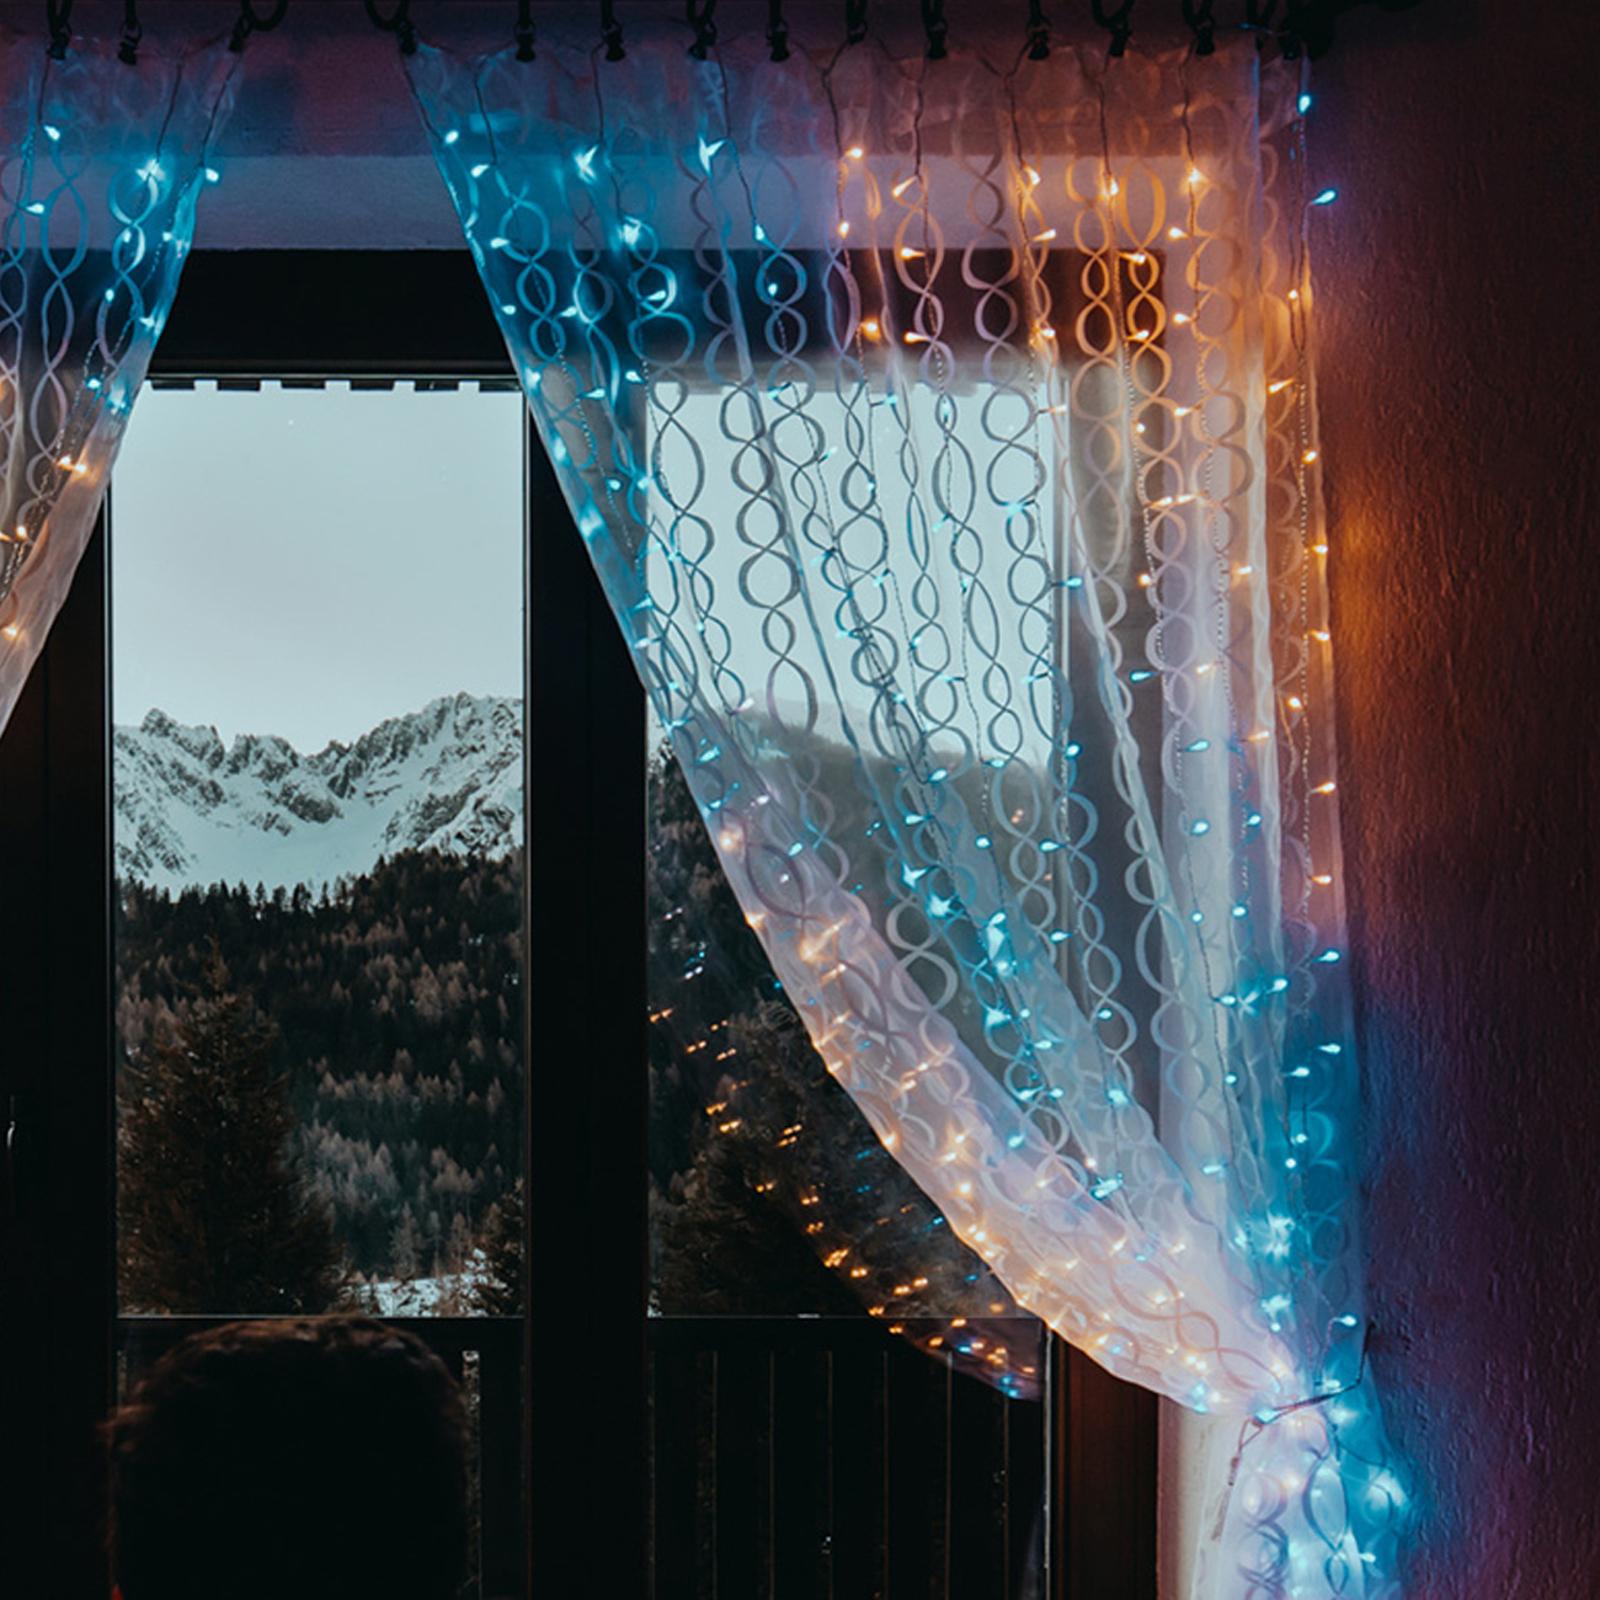 Lysforheng Twinkly RGBW, 210 LED-lyskilder